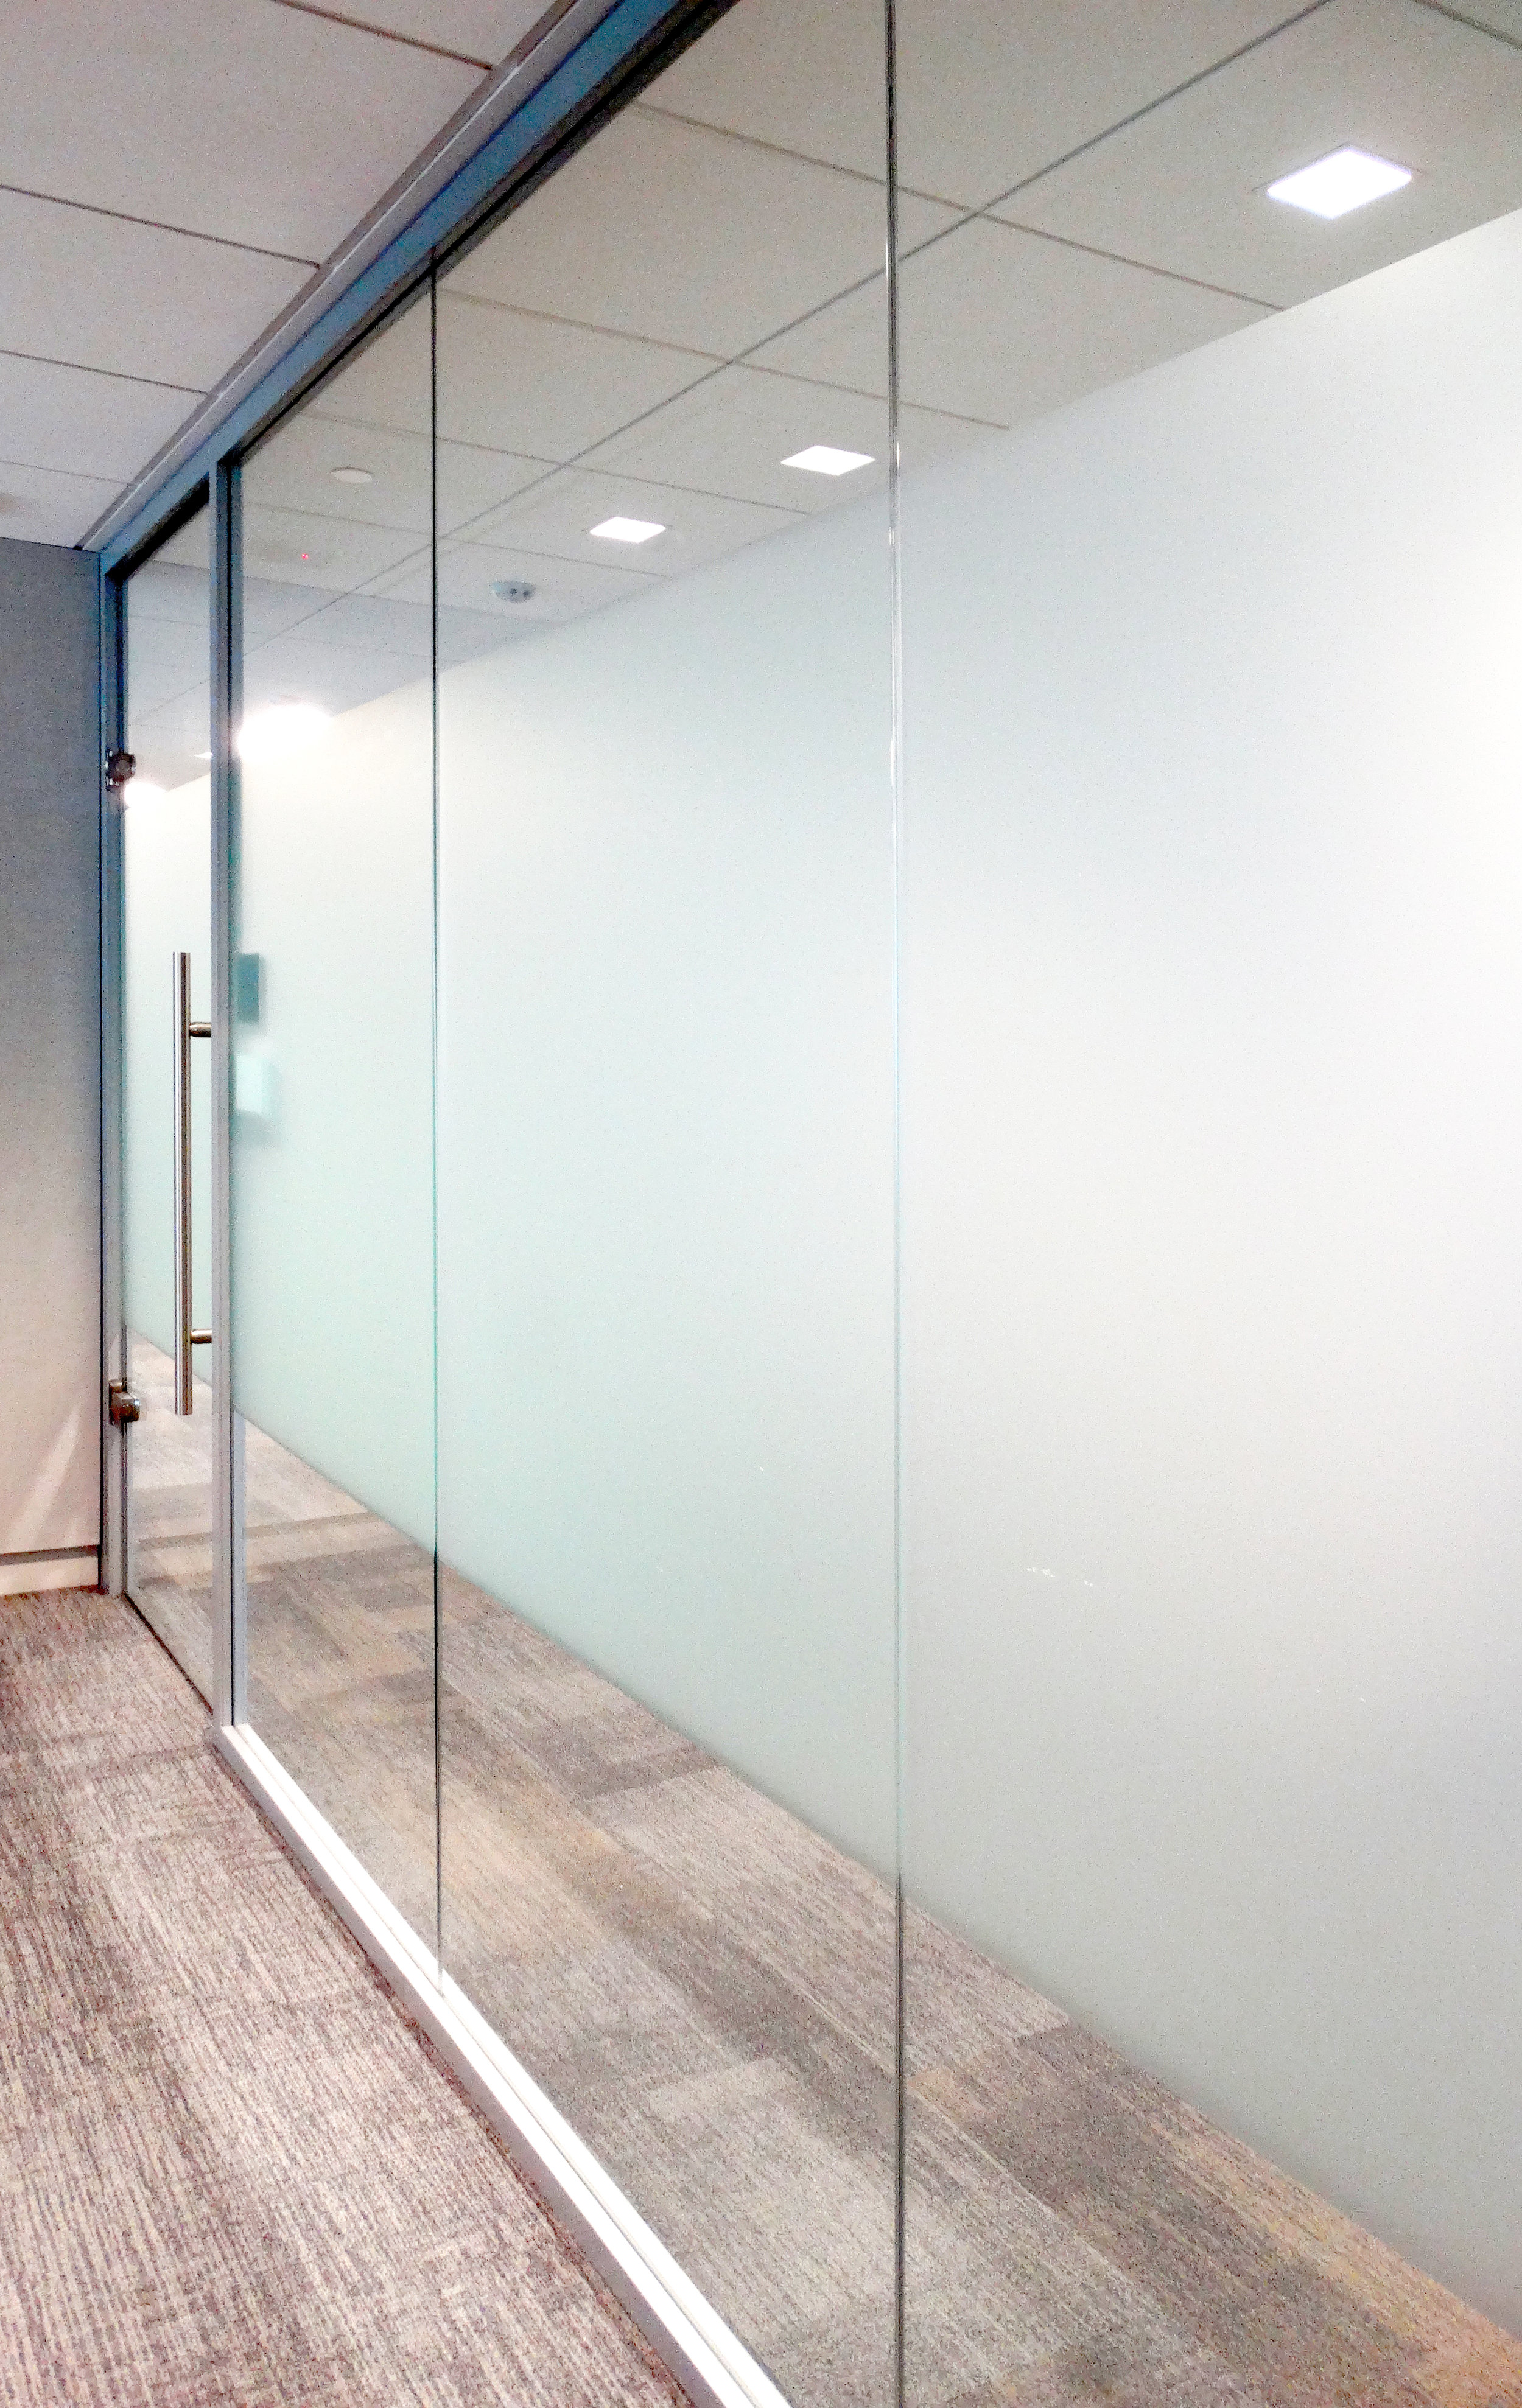 Litespace Aluminum Framed Glass Office Front Film Band - Spaceworks AI.jpg